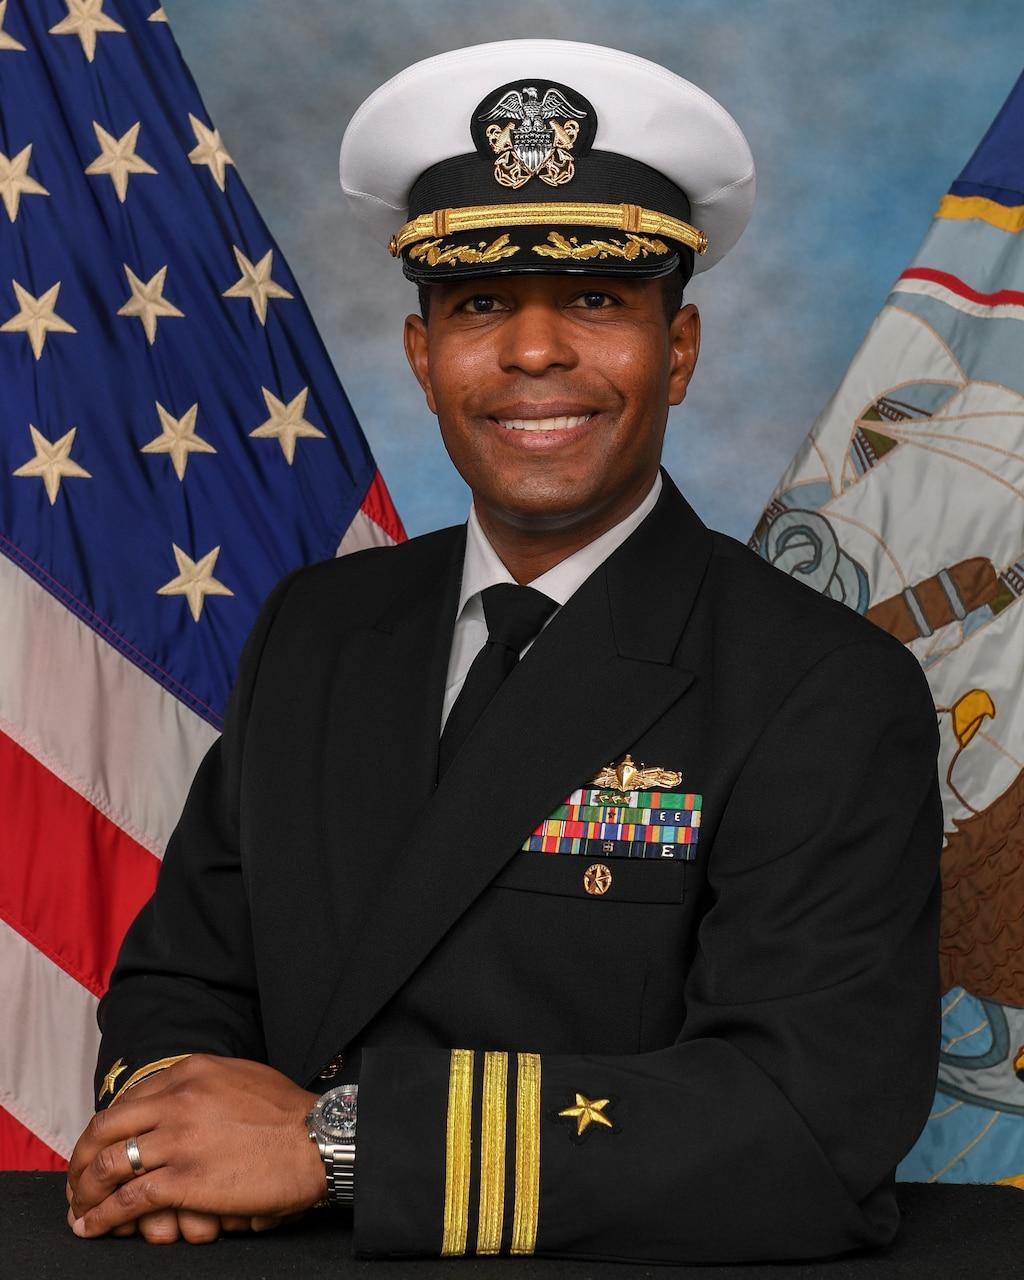 CDR Richard Jimenez